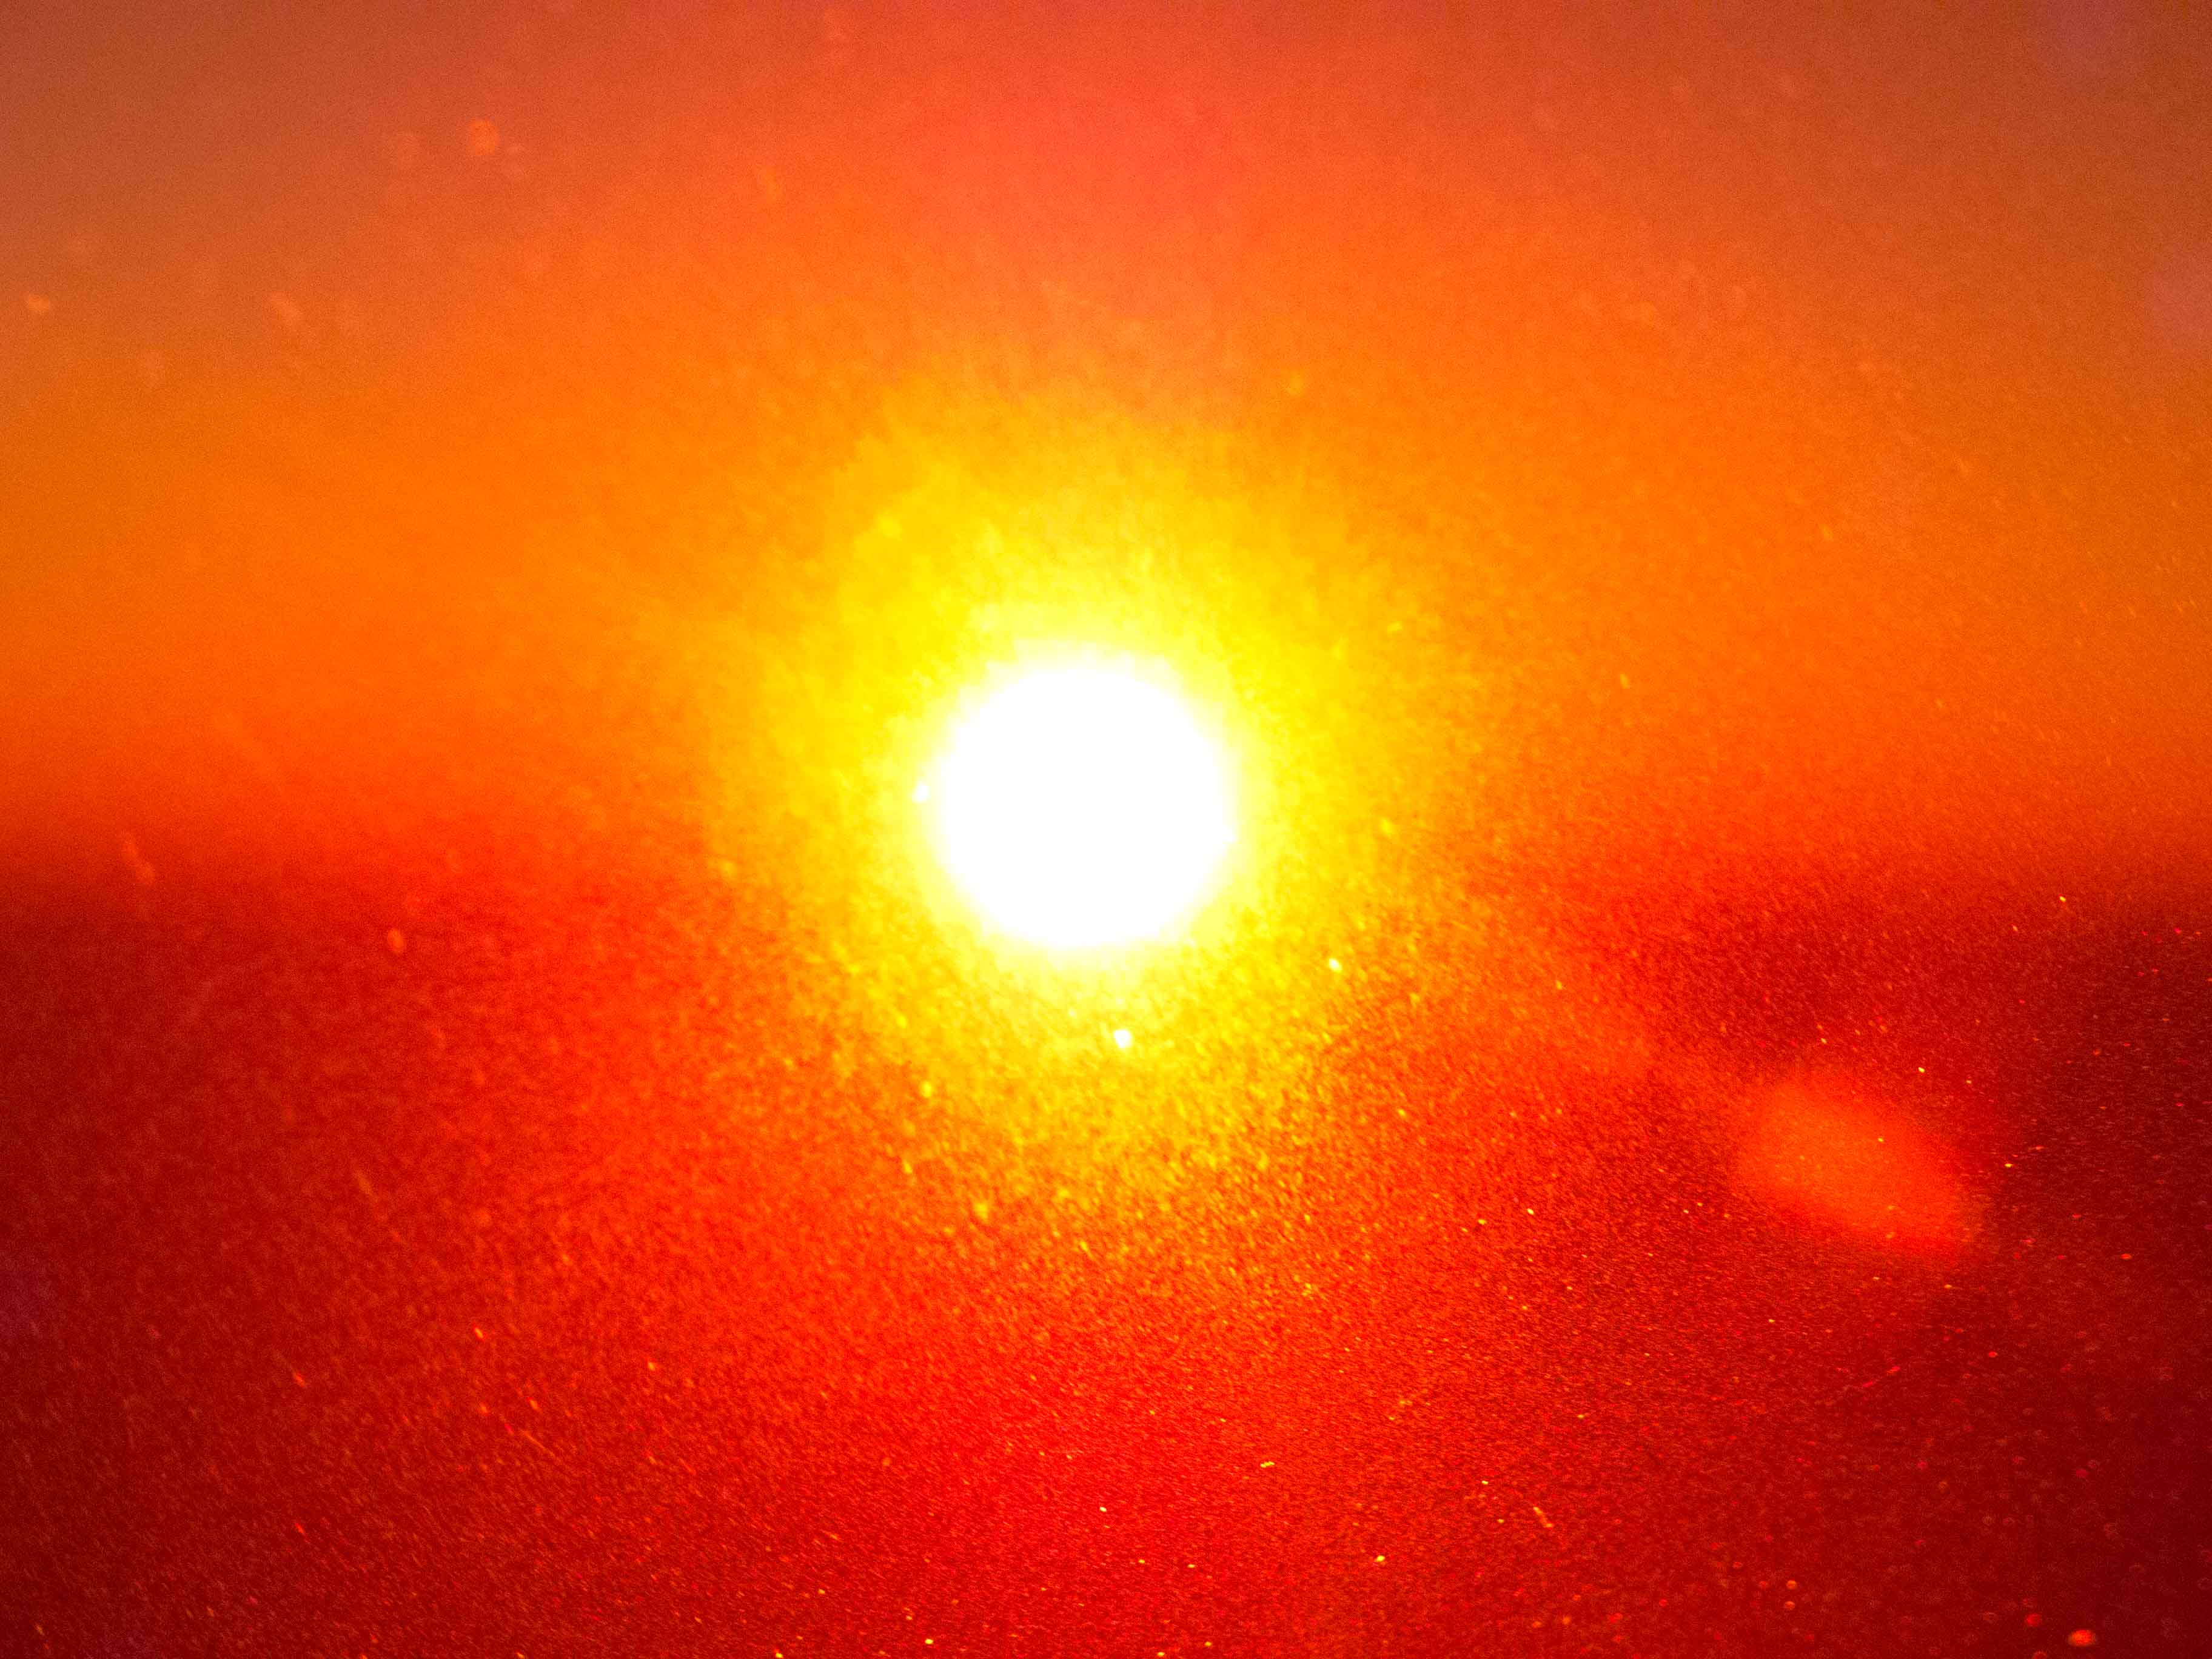 Through sun visor